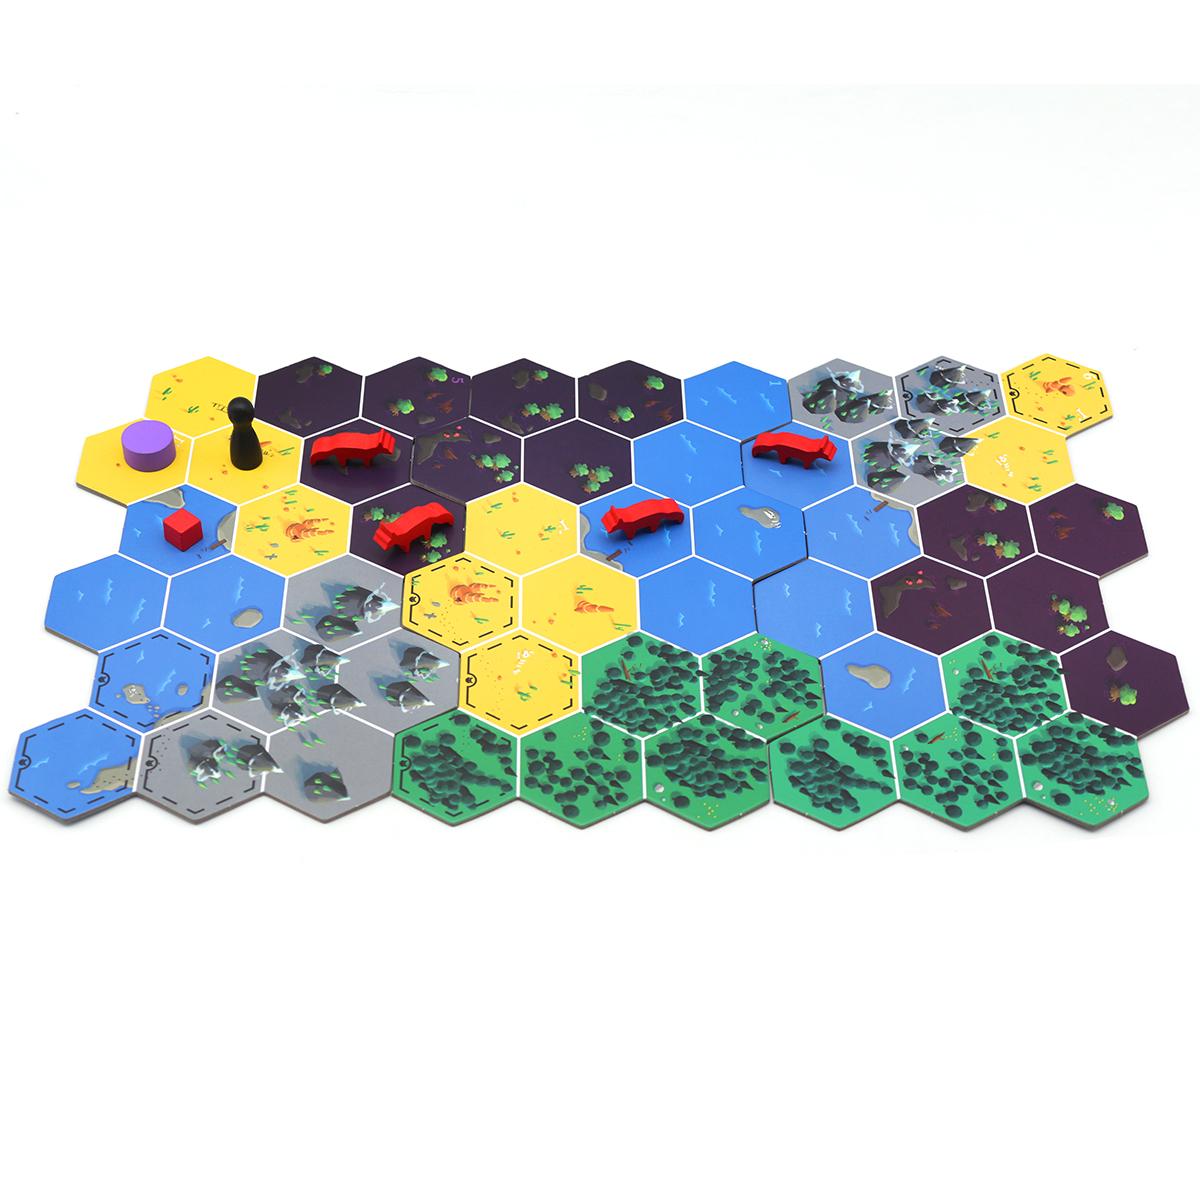 OEM&ODM桌游卡牌、地图、配件定制